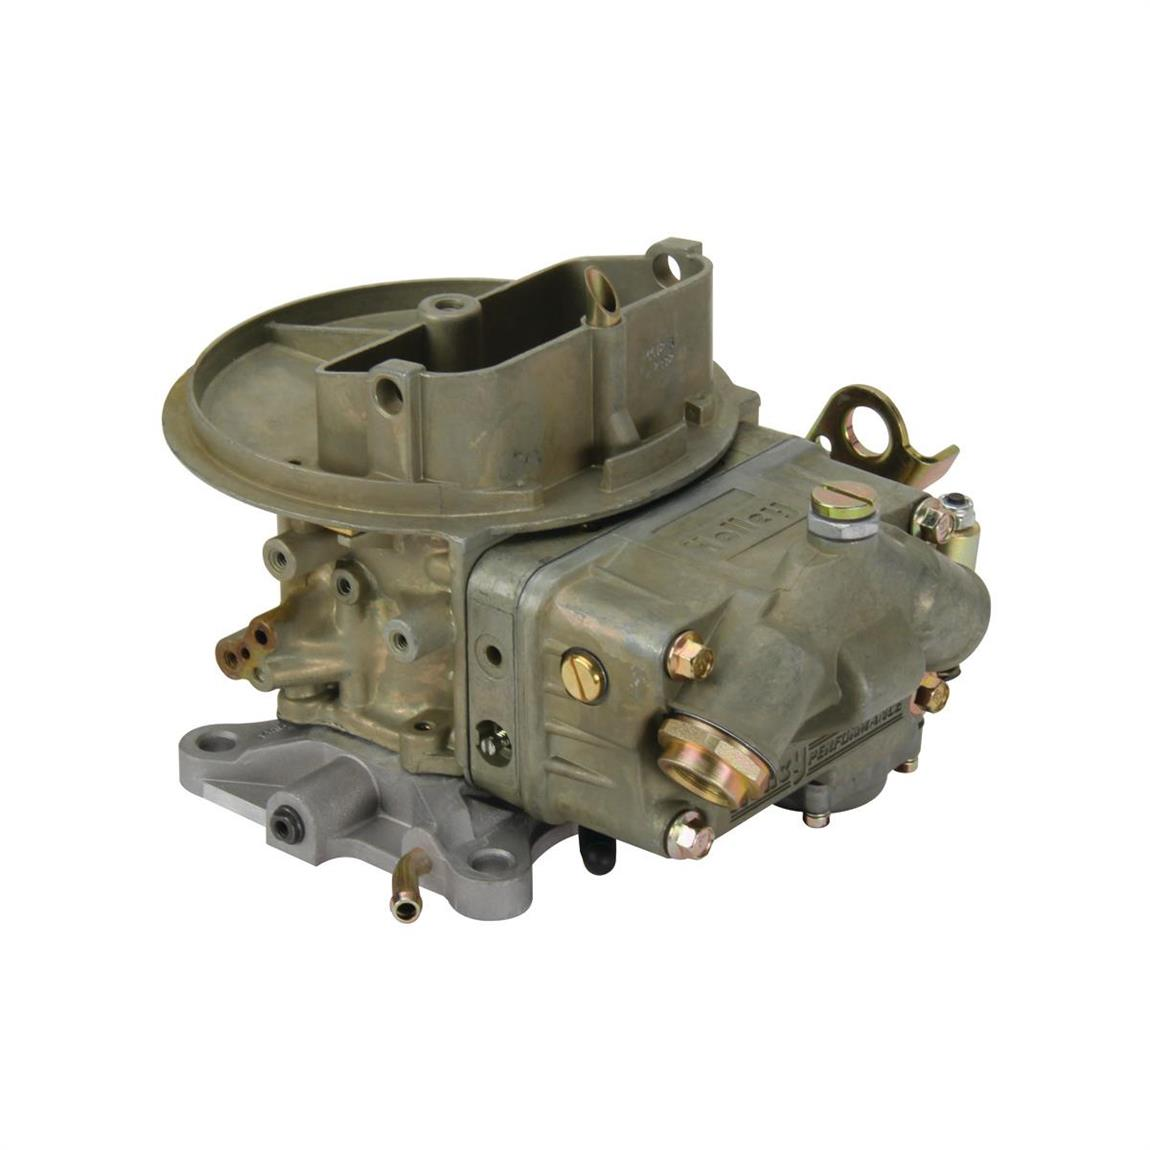 Holley 0-4412CT Circle Track 500 CFM 2 Barrel Carburetor